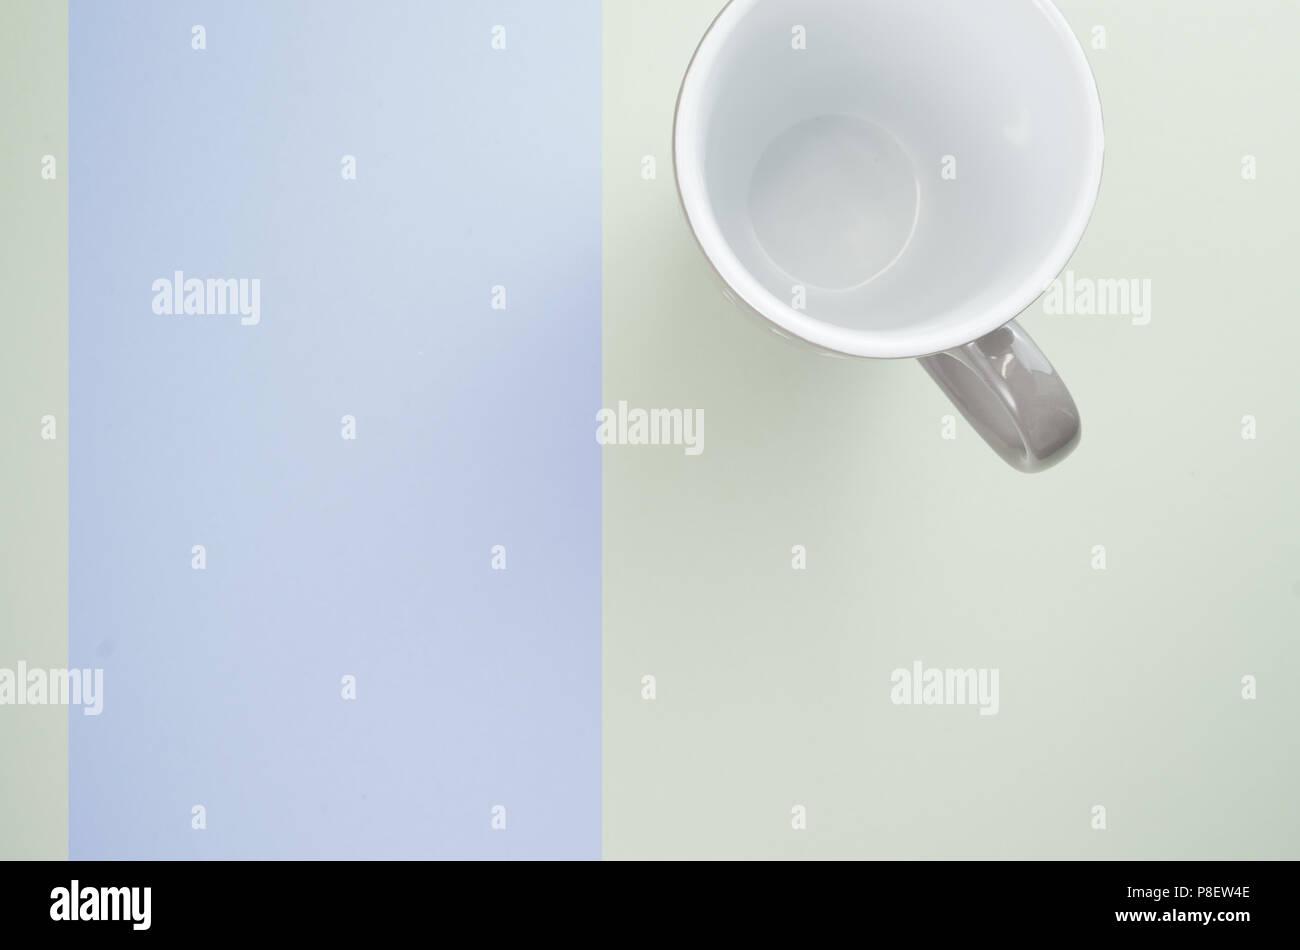 simple empty ceramic mug with white interior - top view - Stock Image